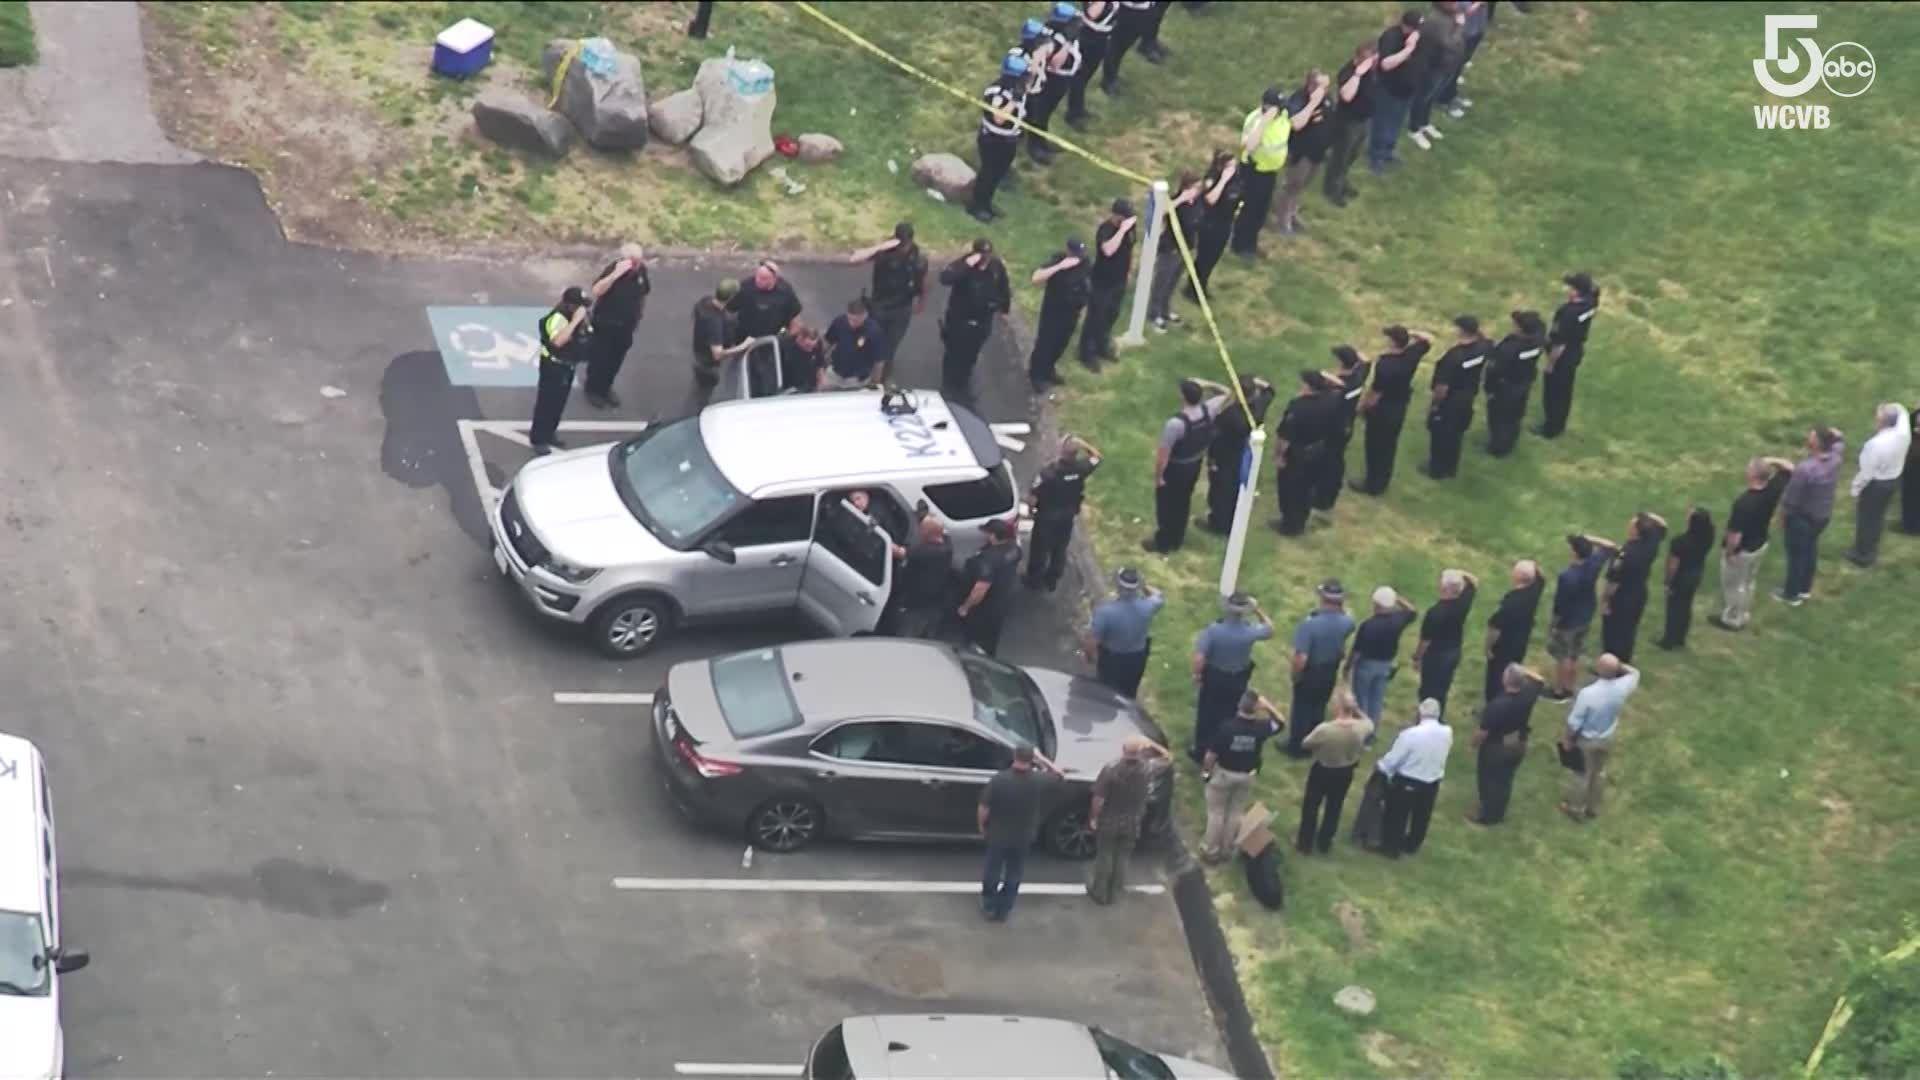 Police salute Braintree Police K9 killed responding to call